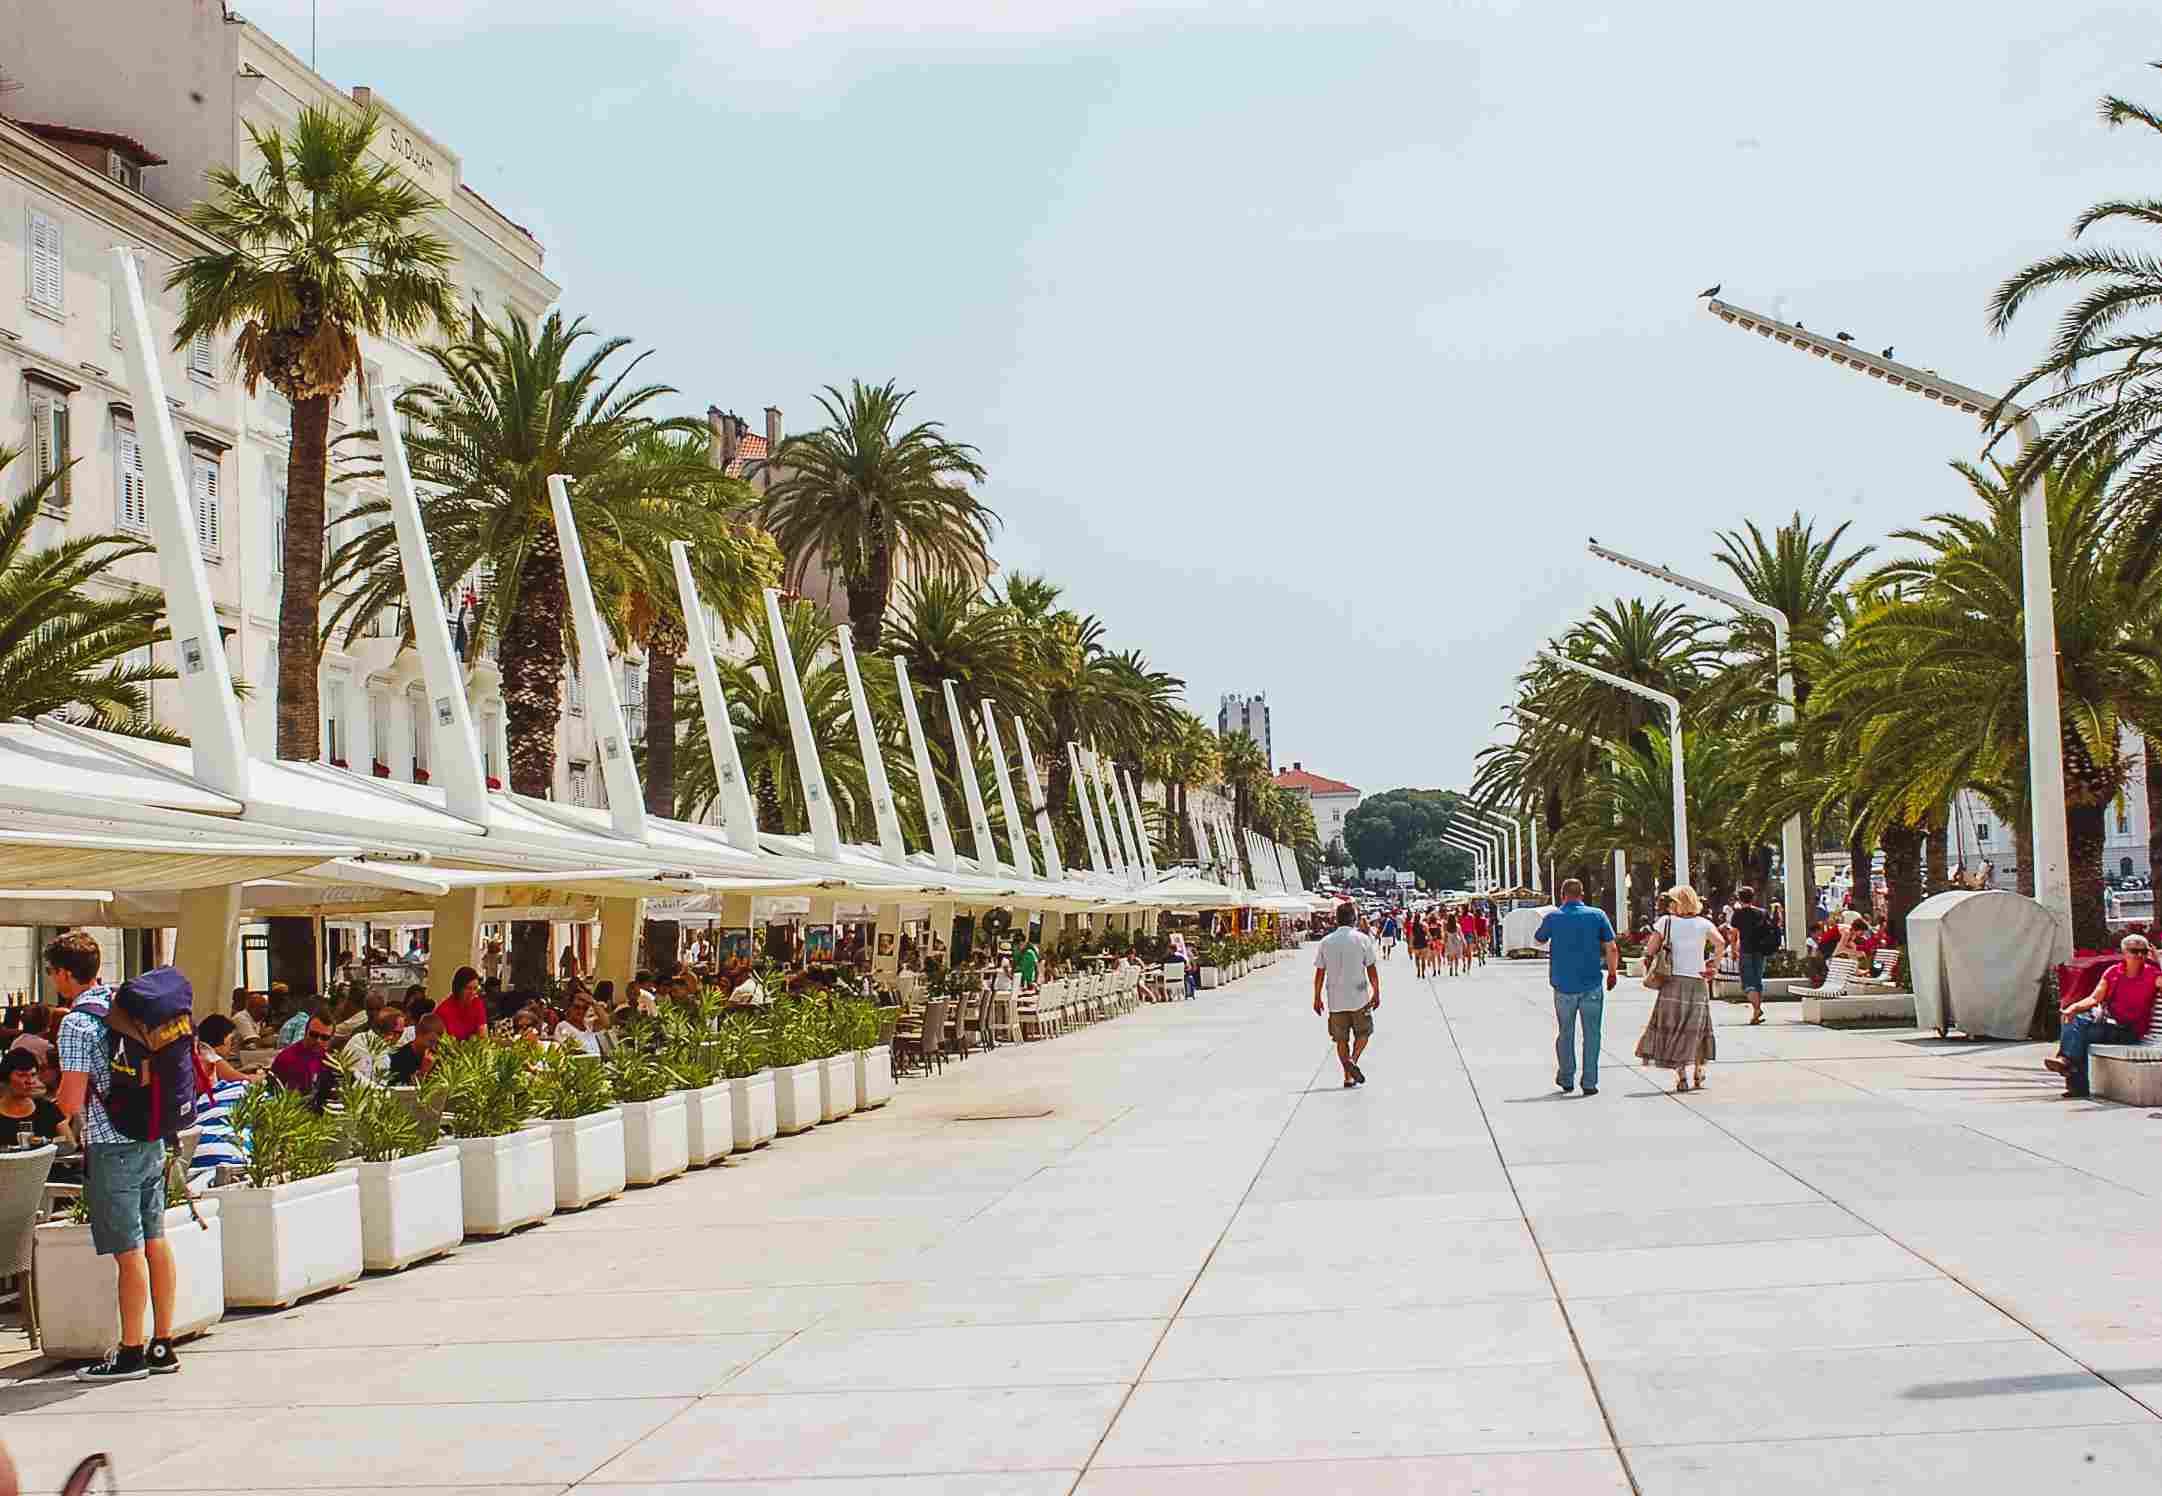 People walking down the main strip in Split